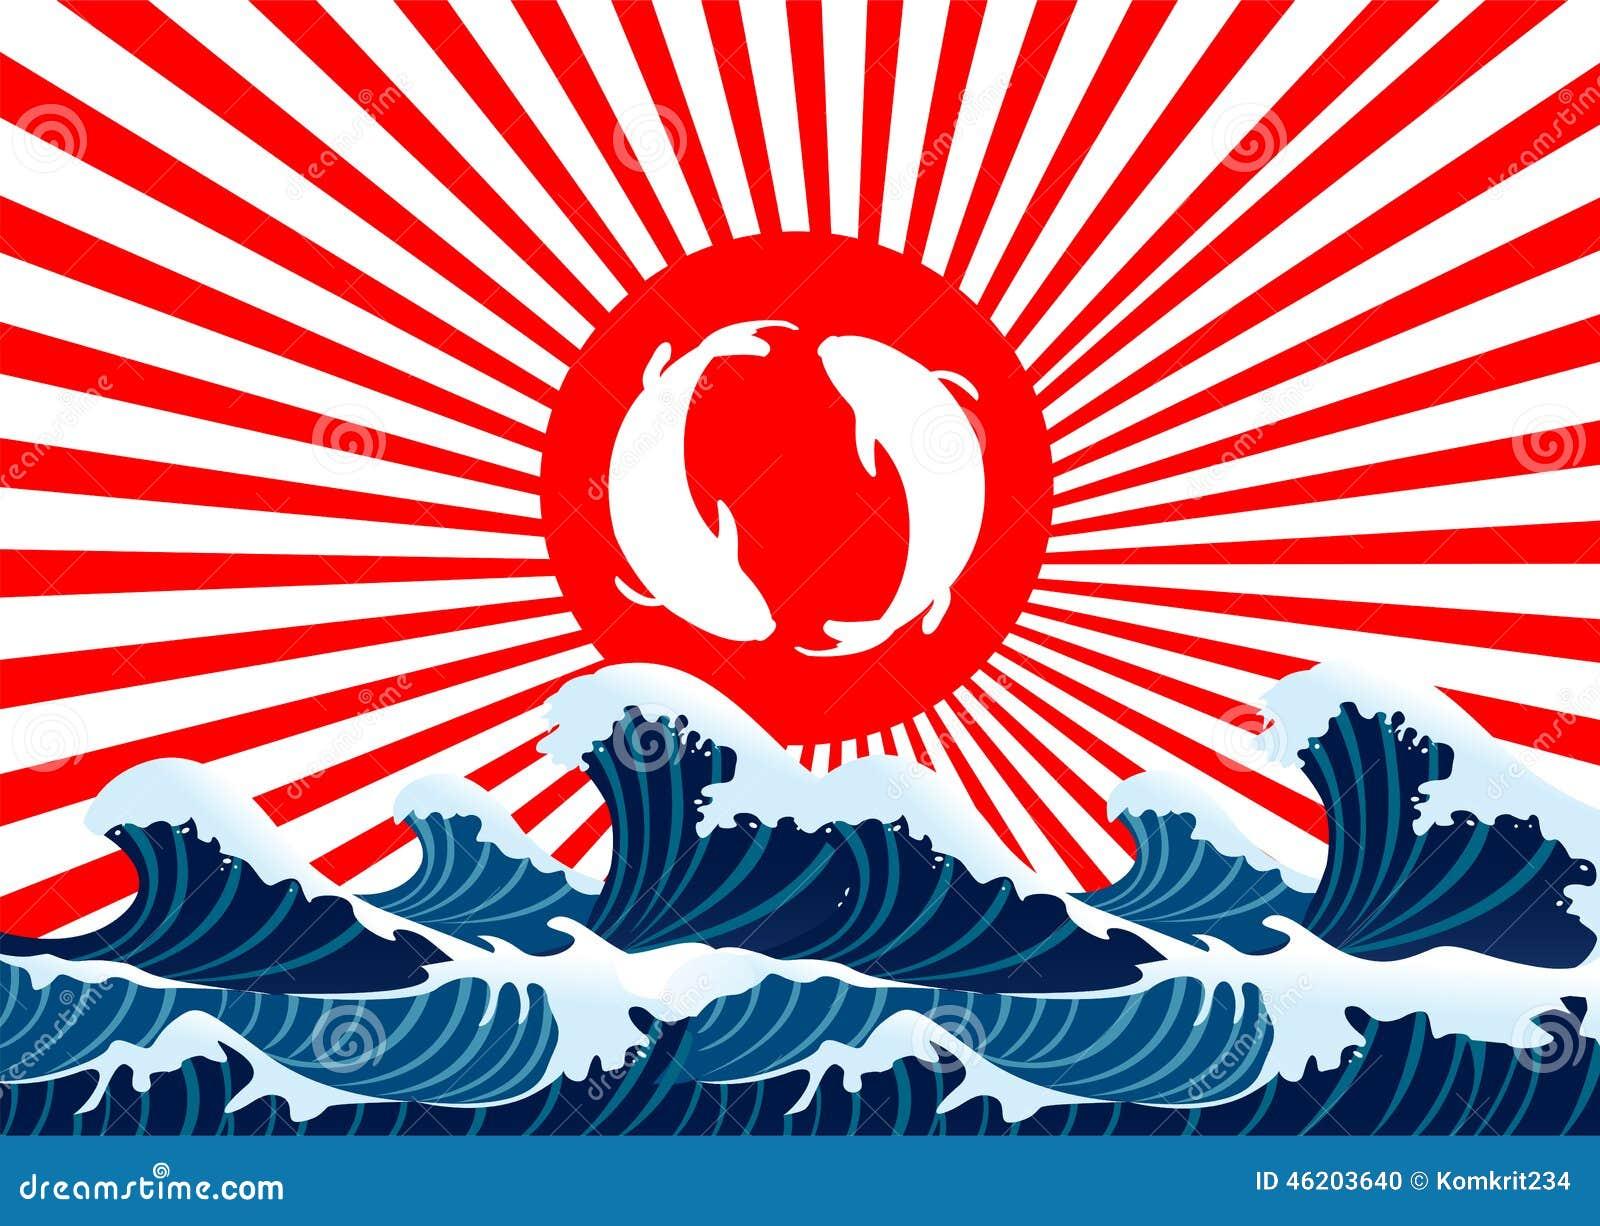 Carp fish yin yang on red flag japanese stock vector for Japanese fish flag